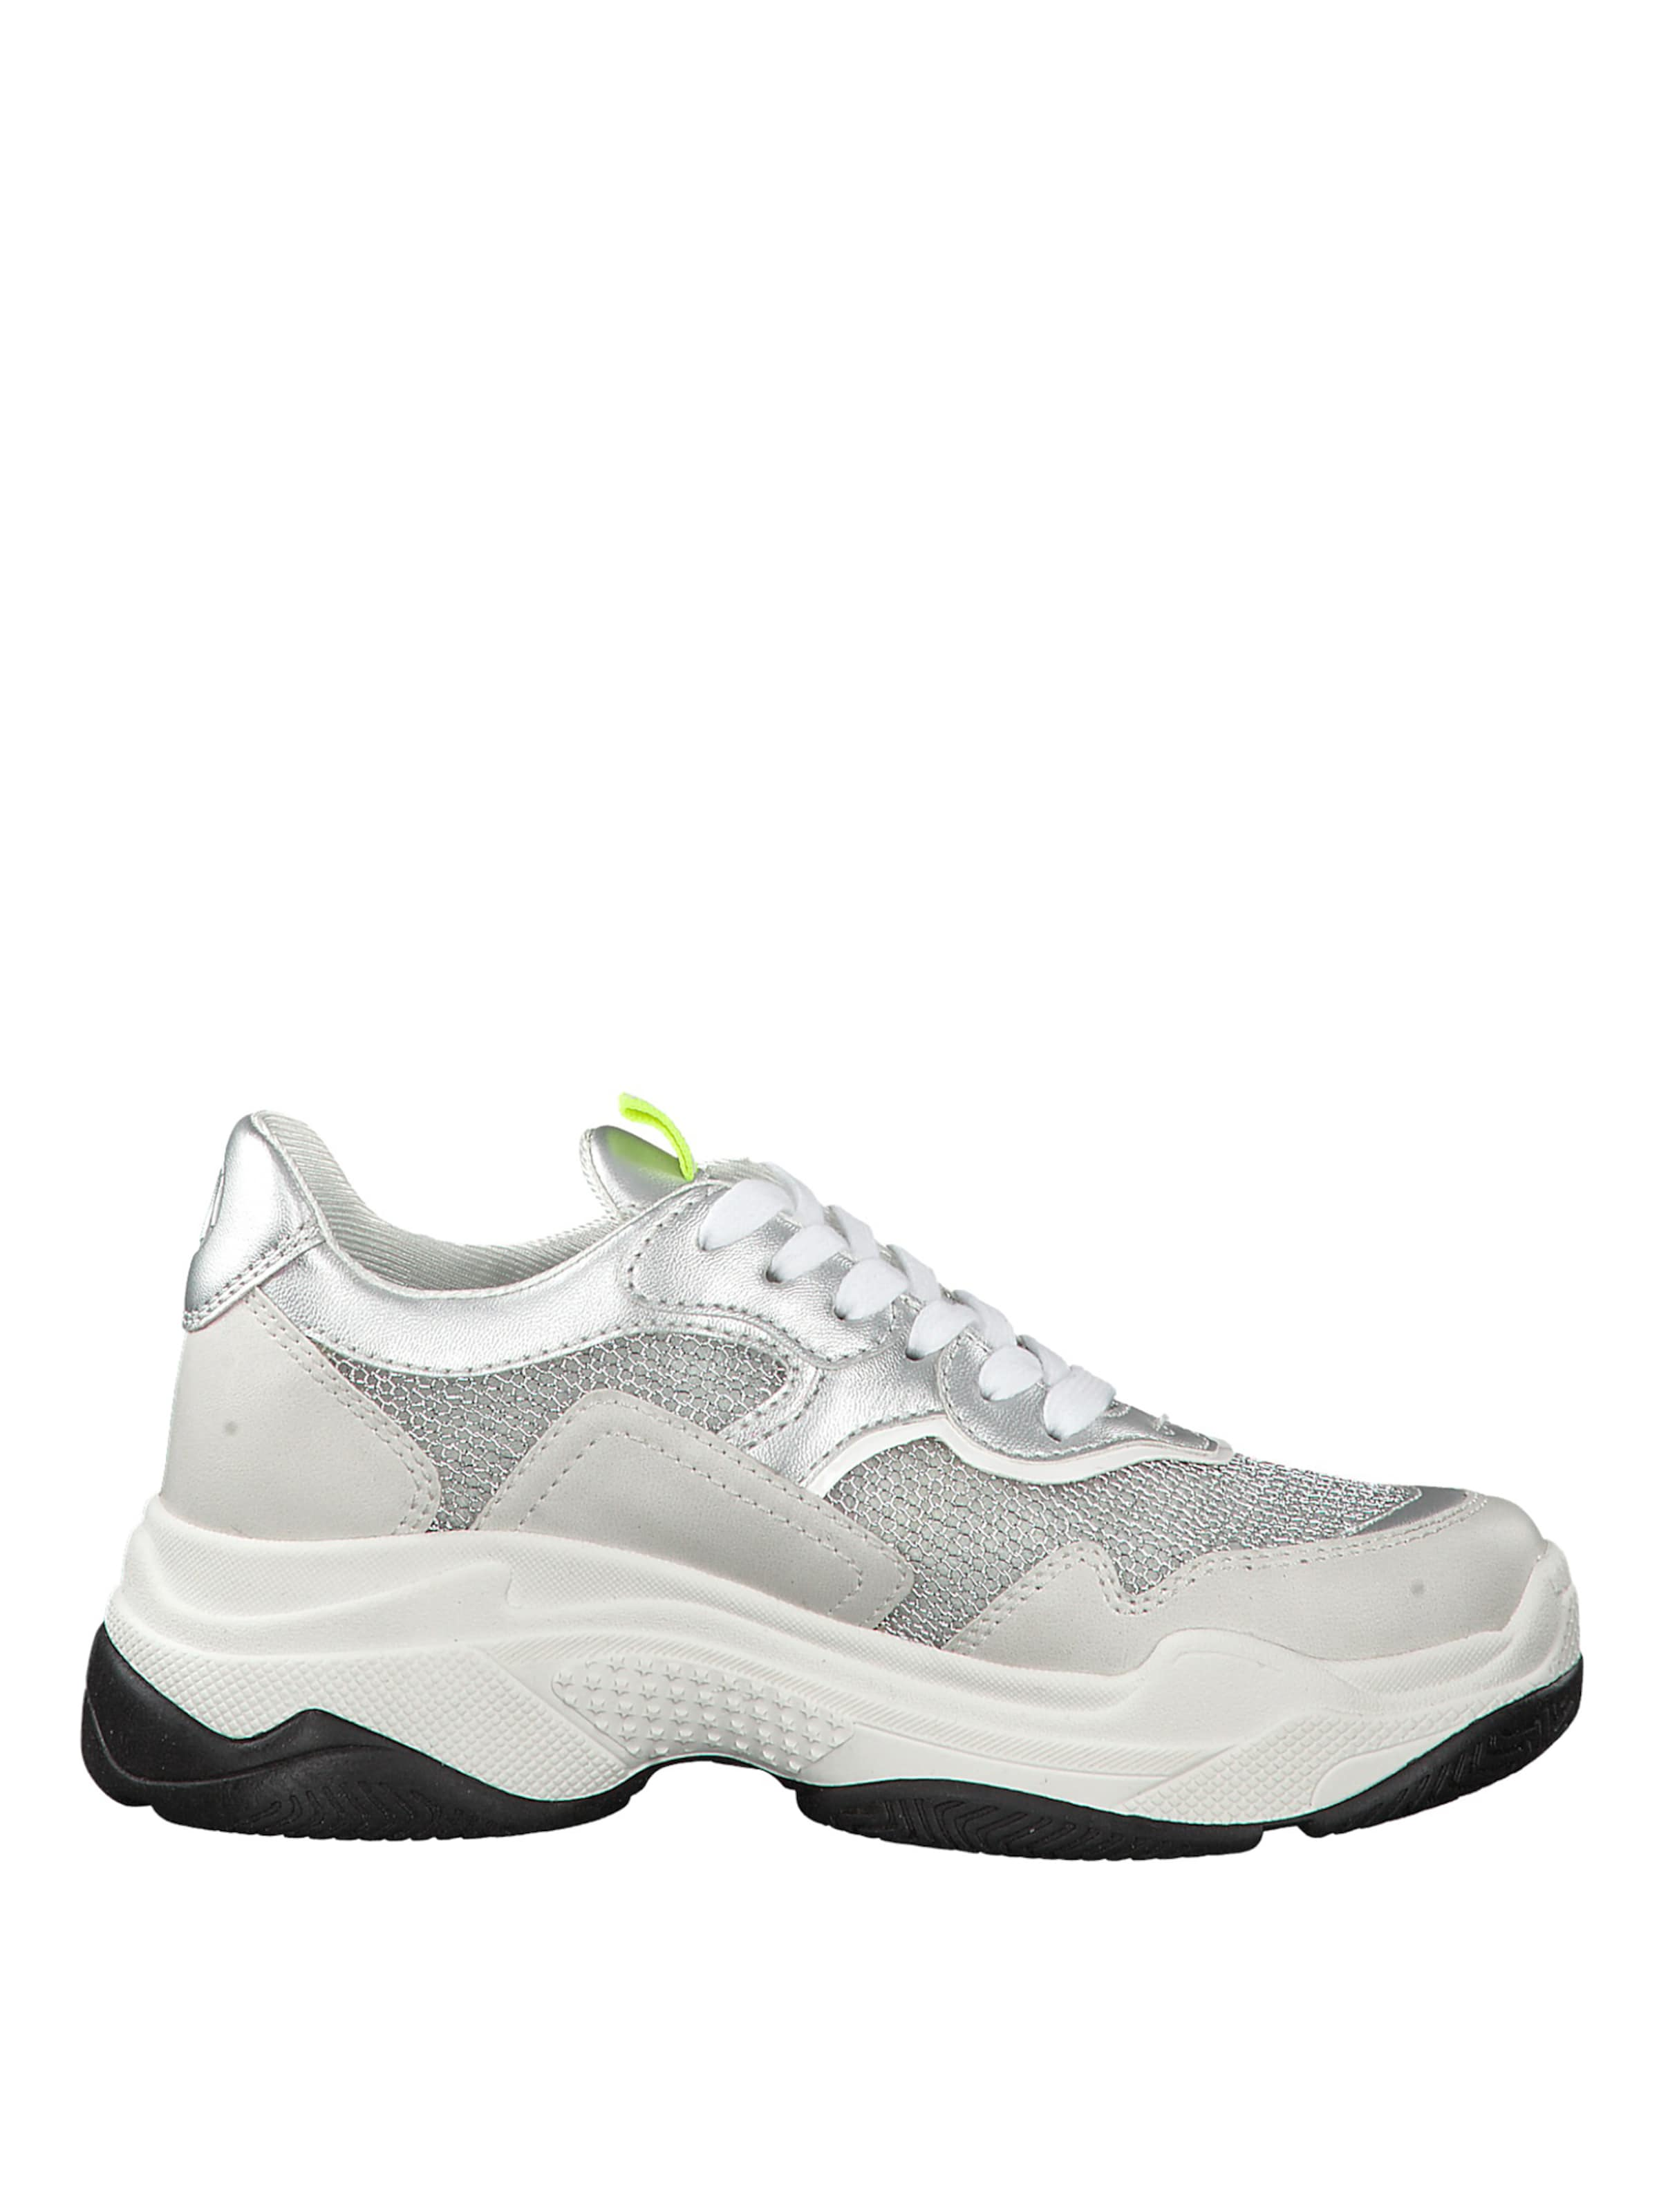 oliver SilberWeiß Label Red S Sneaker In hdsrCxQt